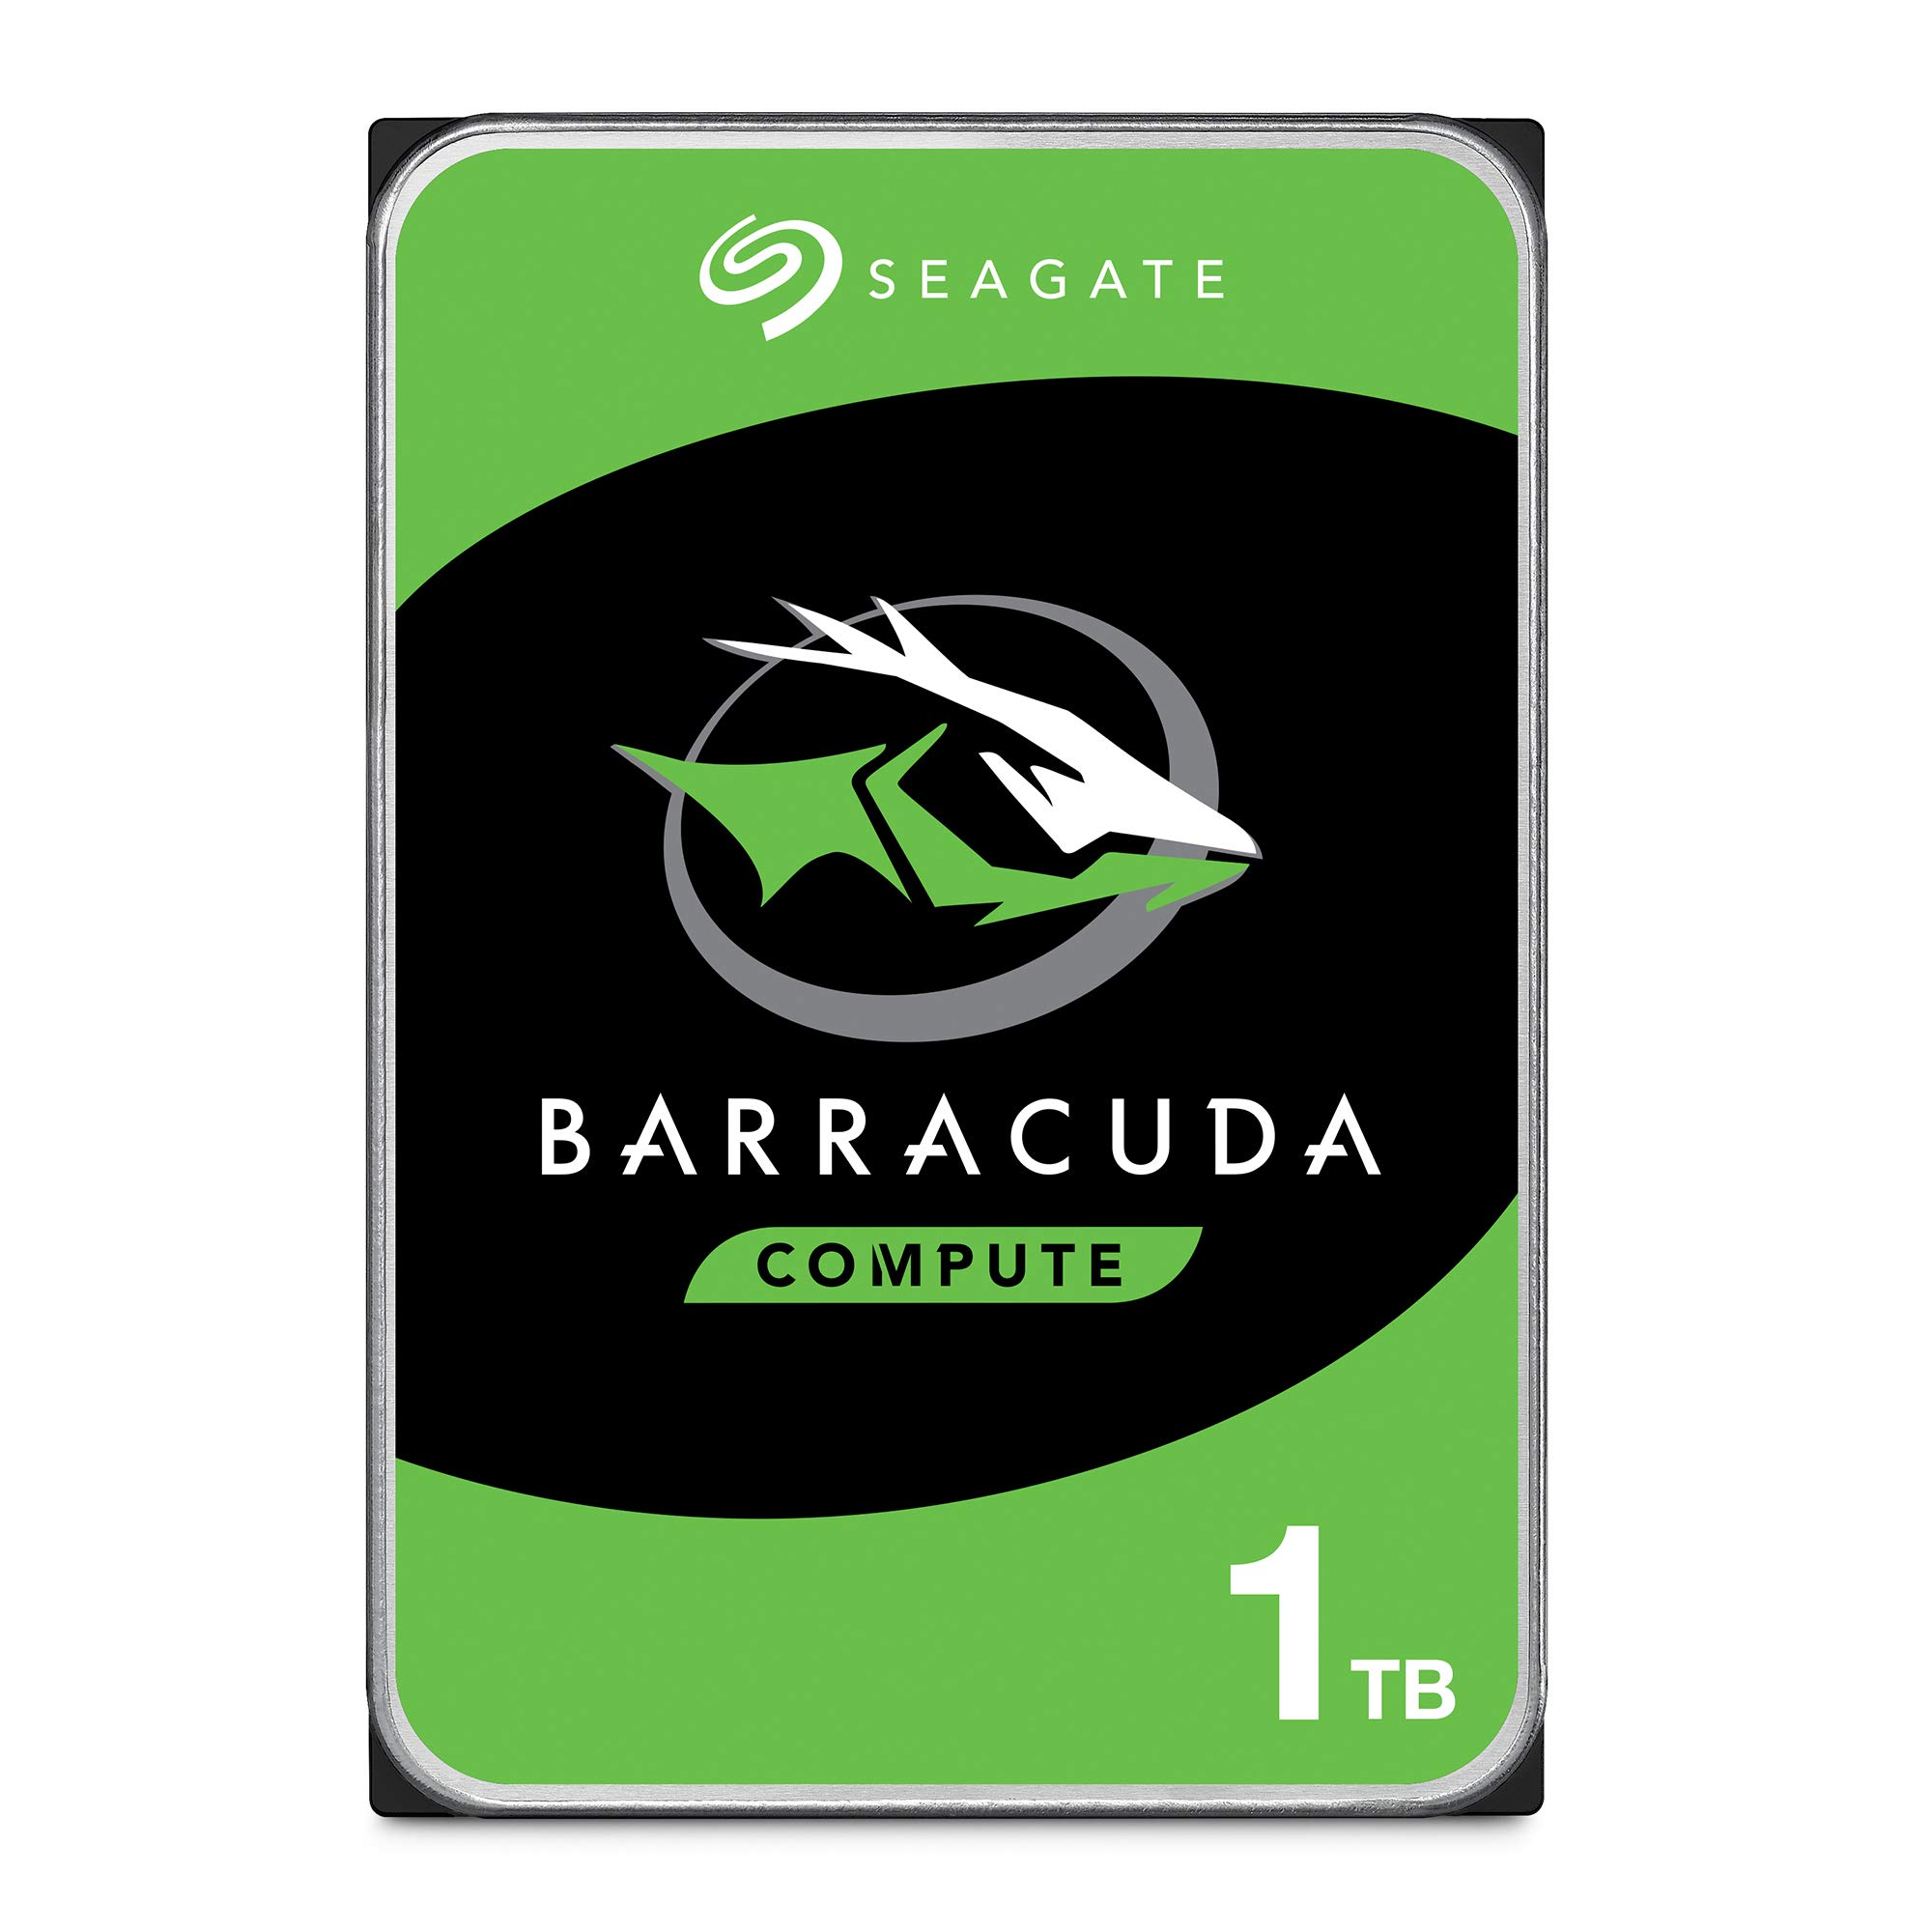 Seagate BarraCuda Internal Hard Drive